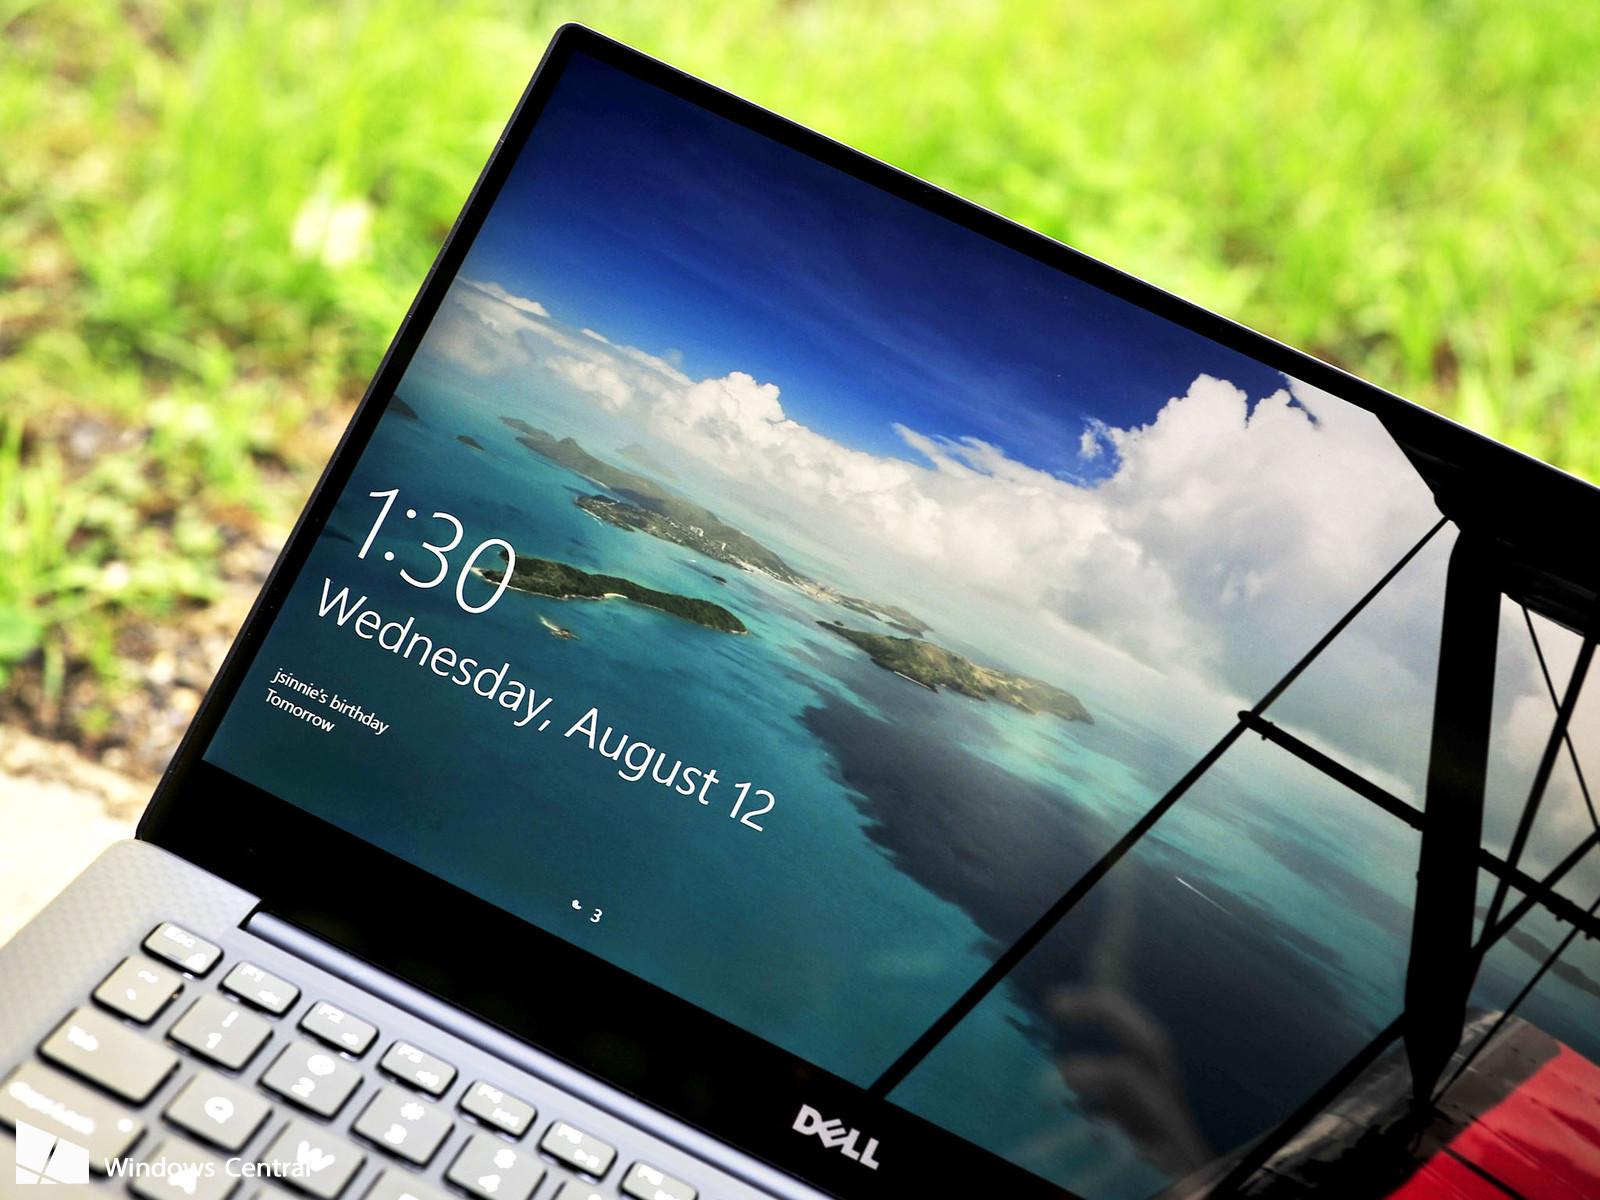 How To Save Windows Spotlight Lockscreen Images So Lock